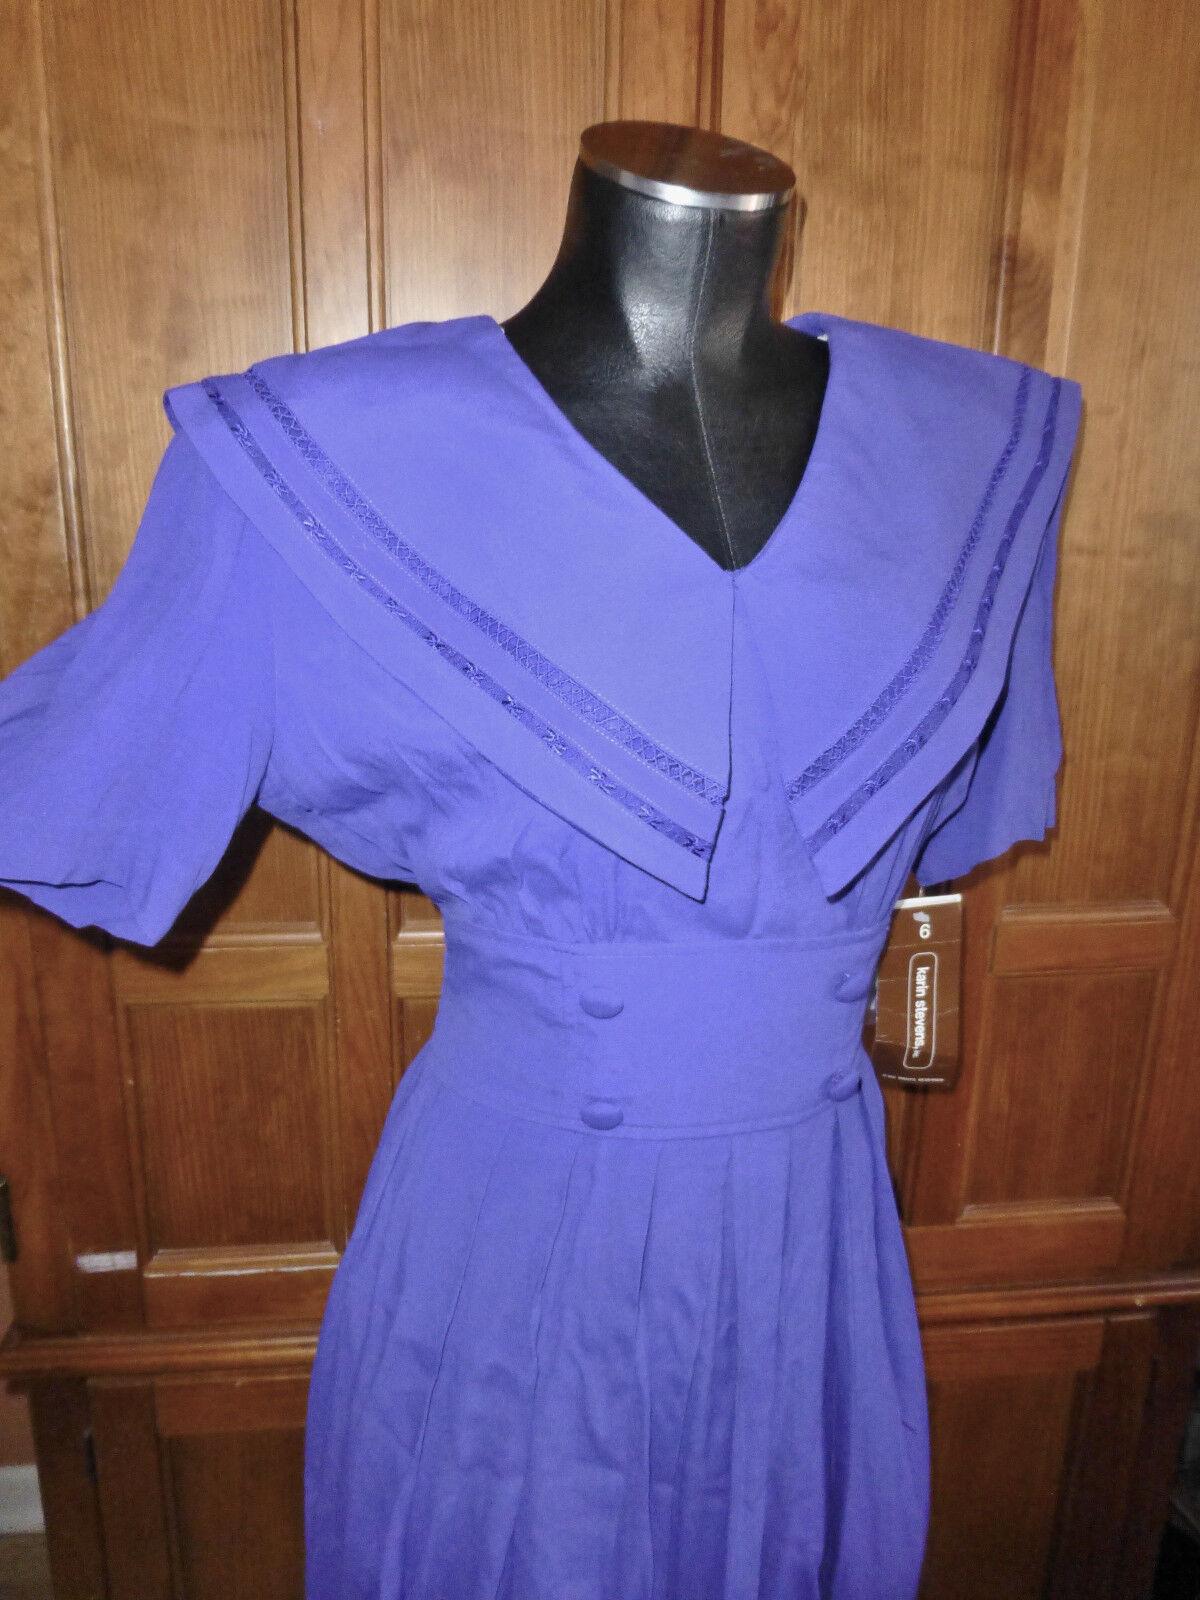 NOS Vtg 80s on 40s Karin Stevens Saylor Collar lila Tea Party Midi DRESS NEW